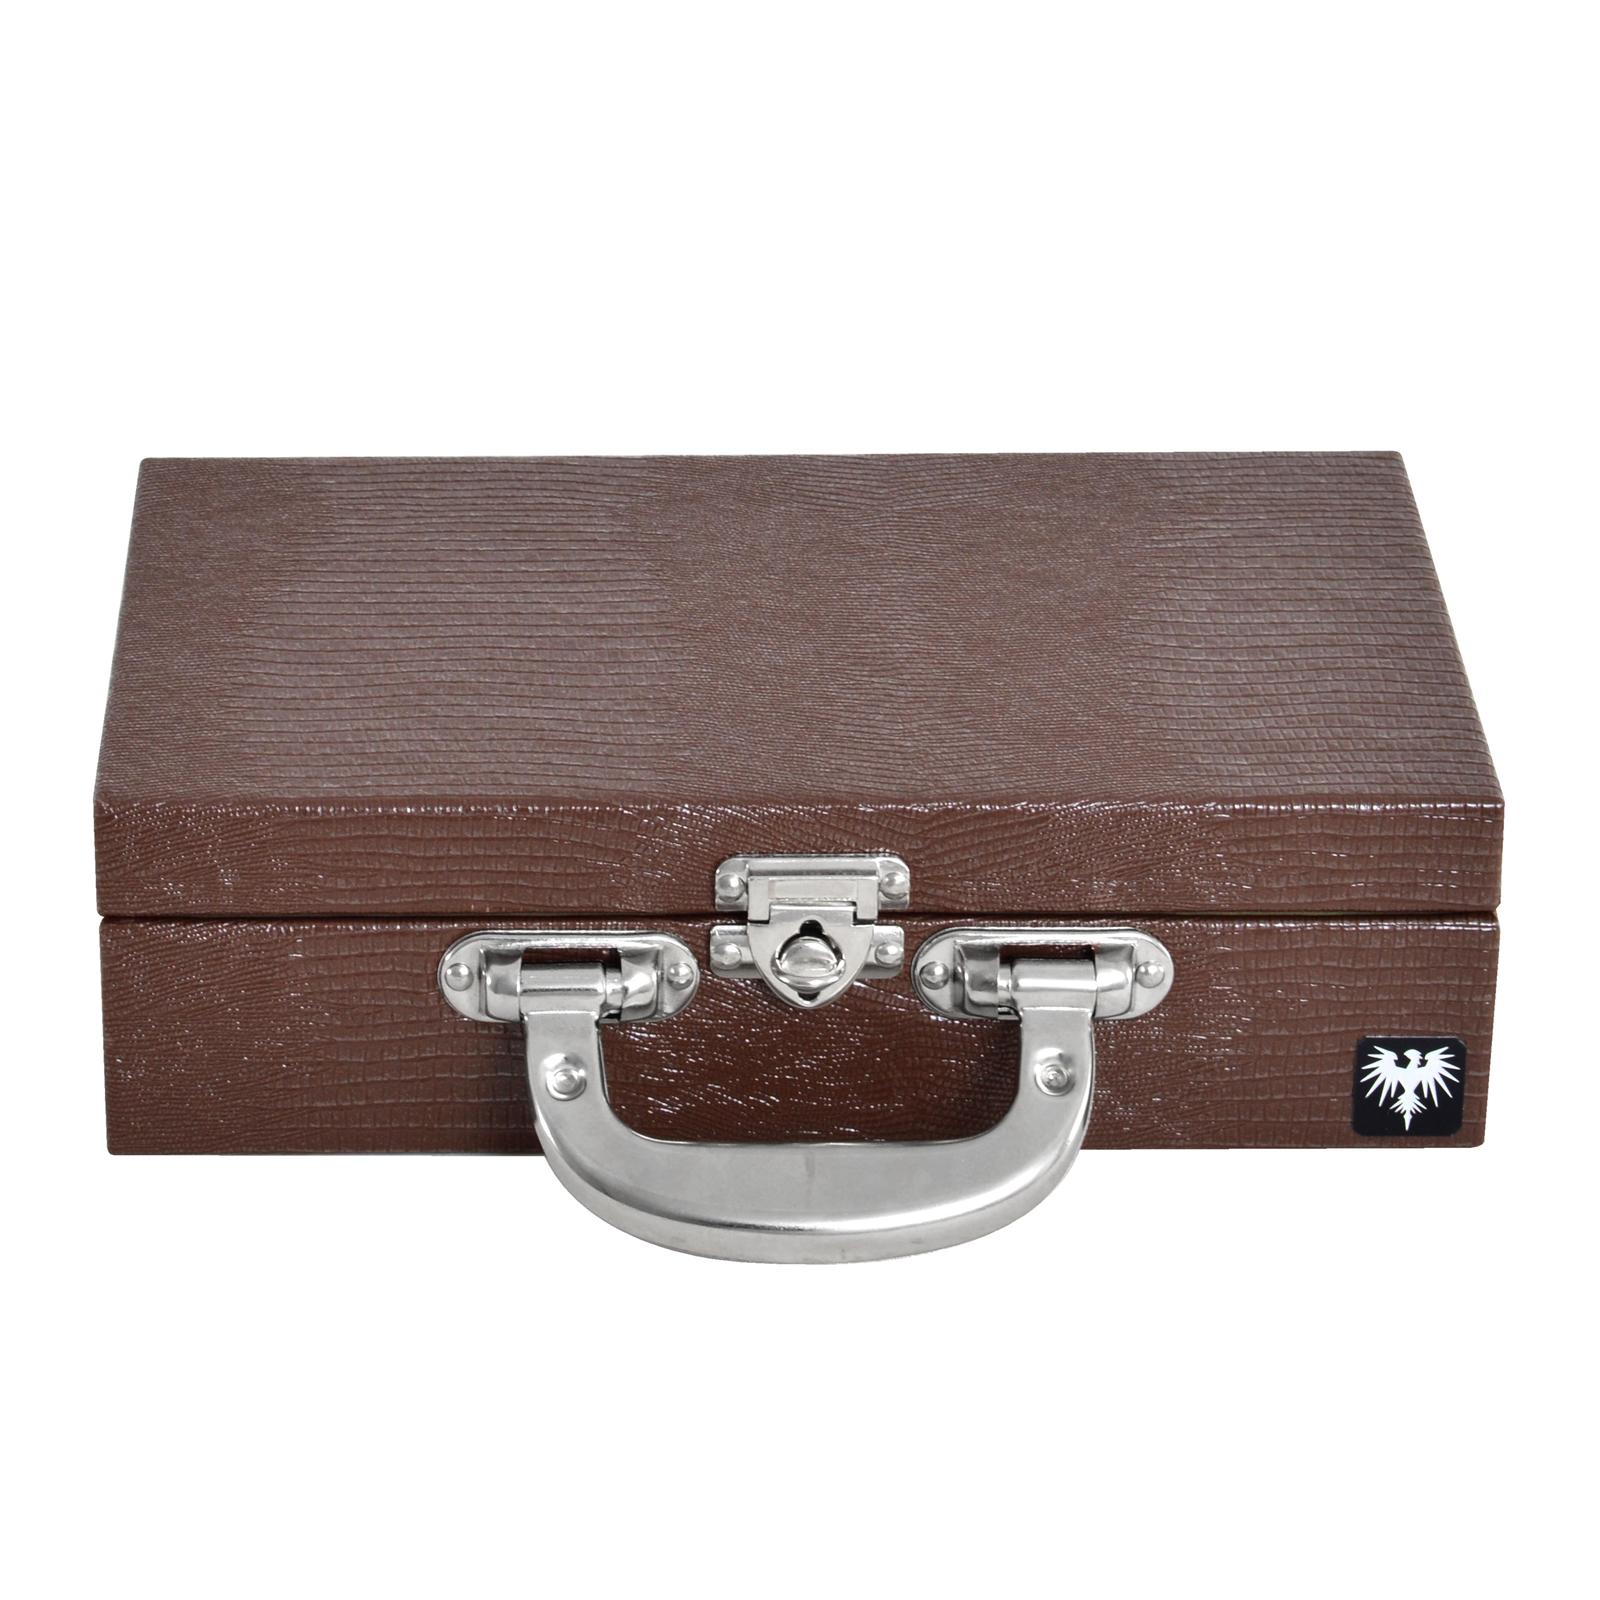 maleta-porta-joias-couro-ecologico-croco-marrom-bege-imagem-4.jpg